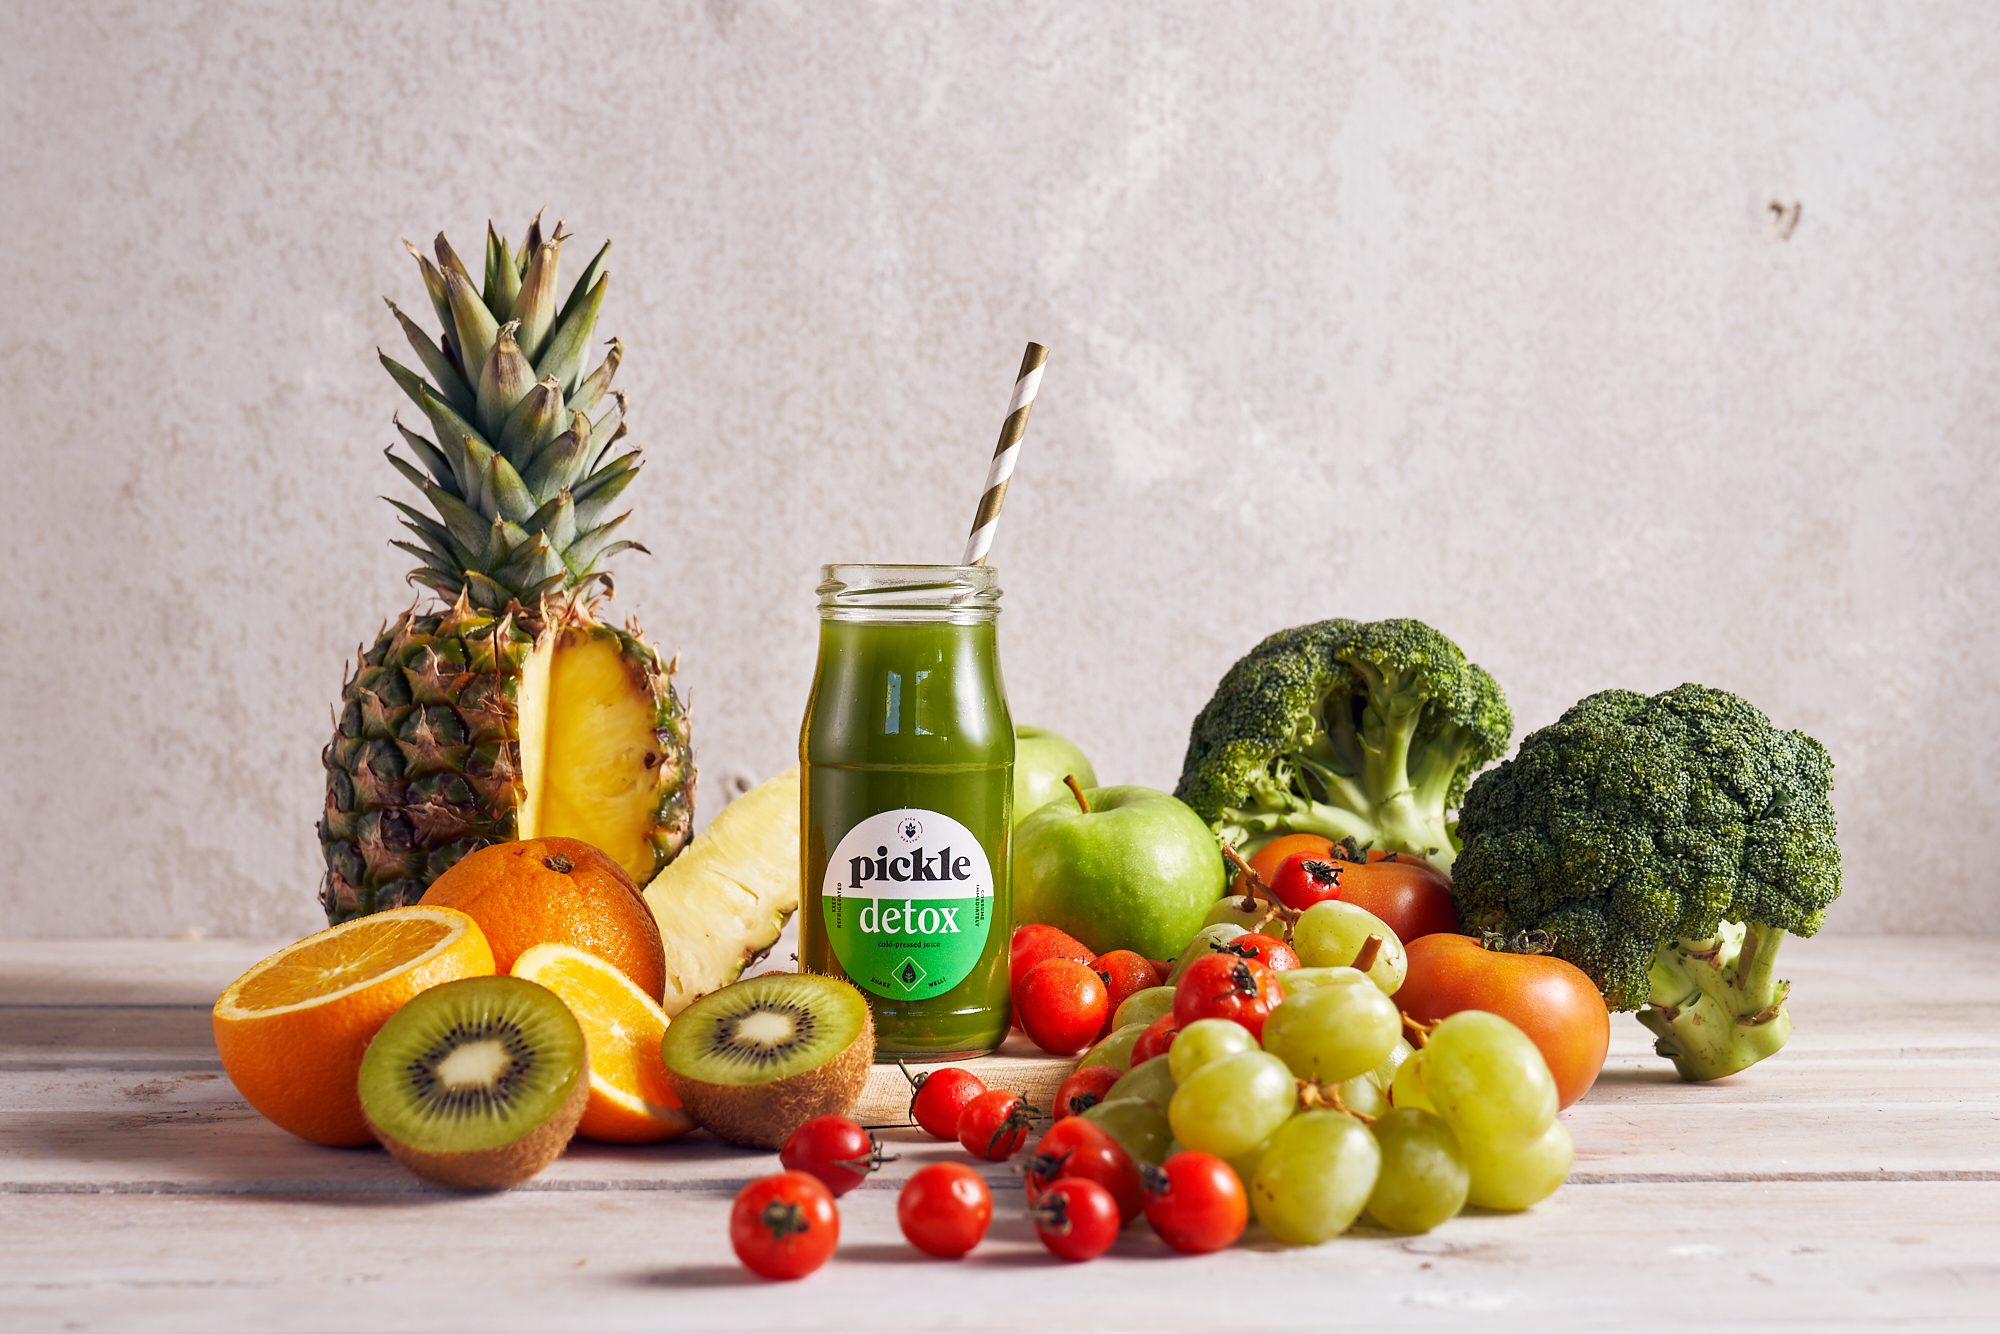 Juice Cleanse Detox Pickle